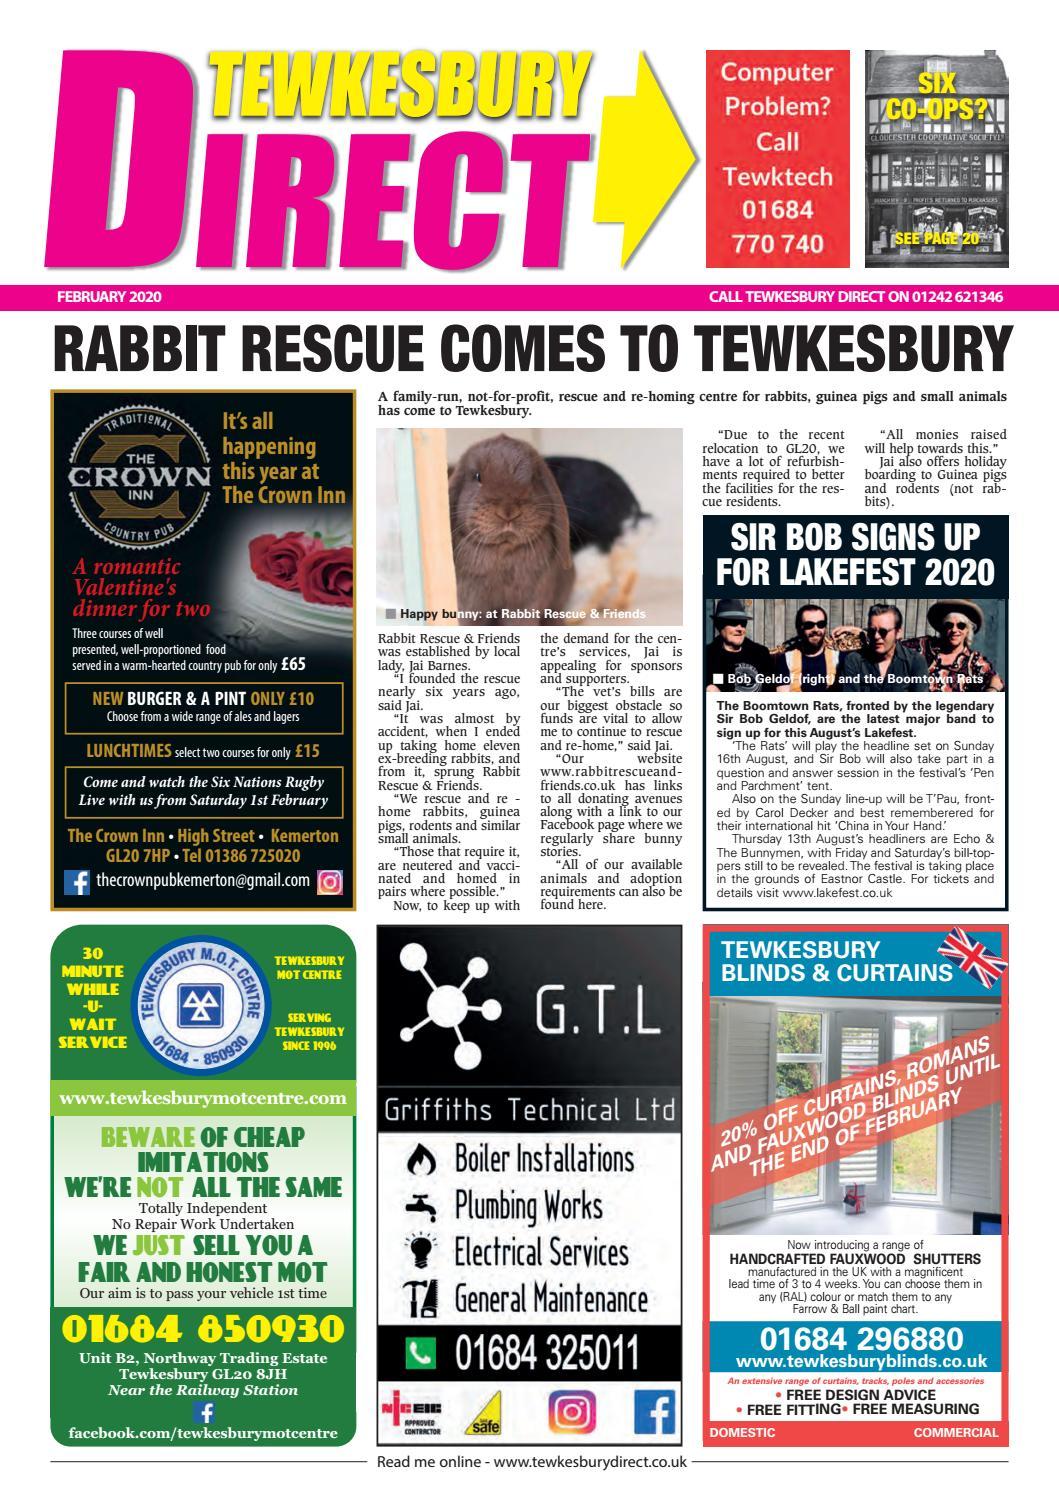 Tewkesbury Direct Magazine February 2020 By Tewkesbury Direct Magazine Issuu